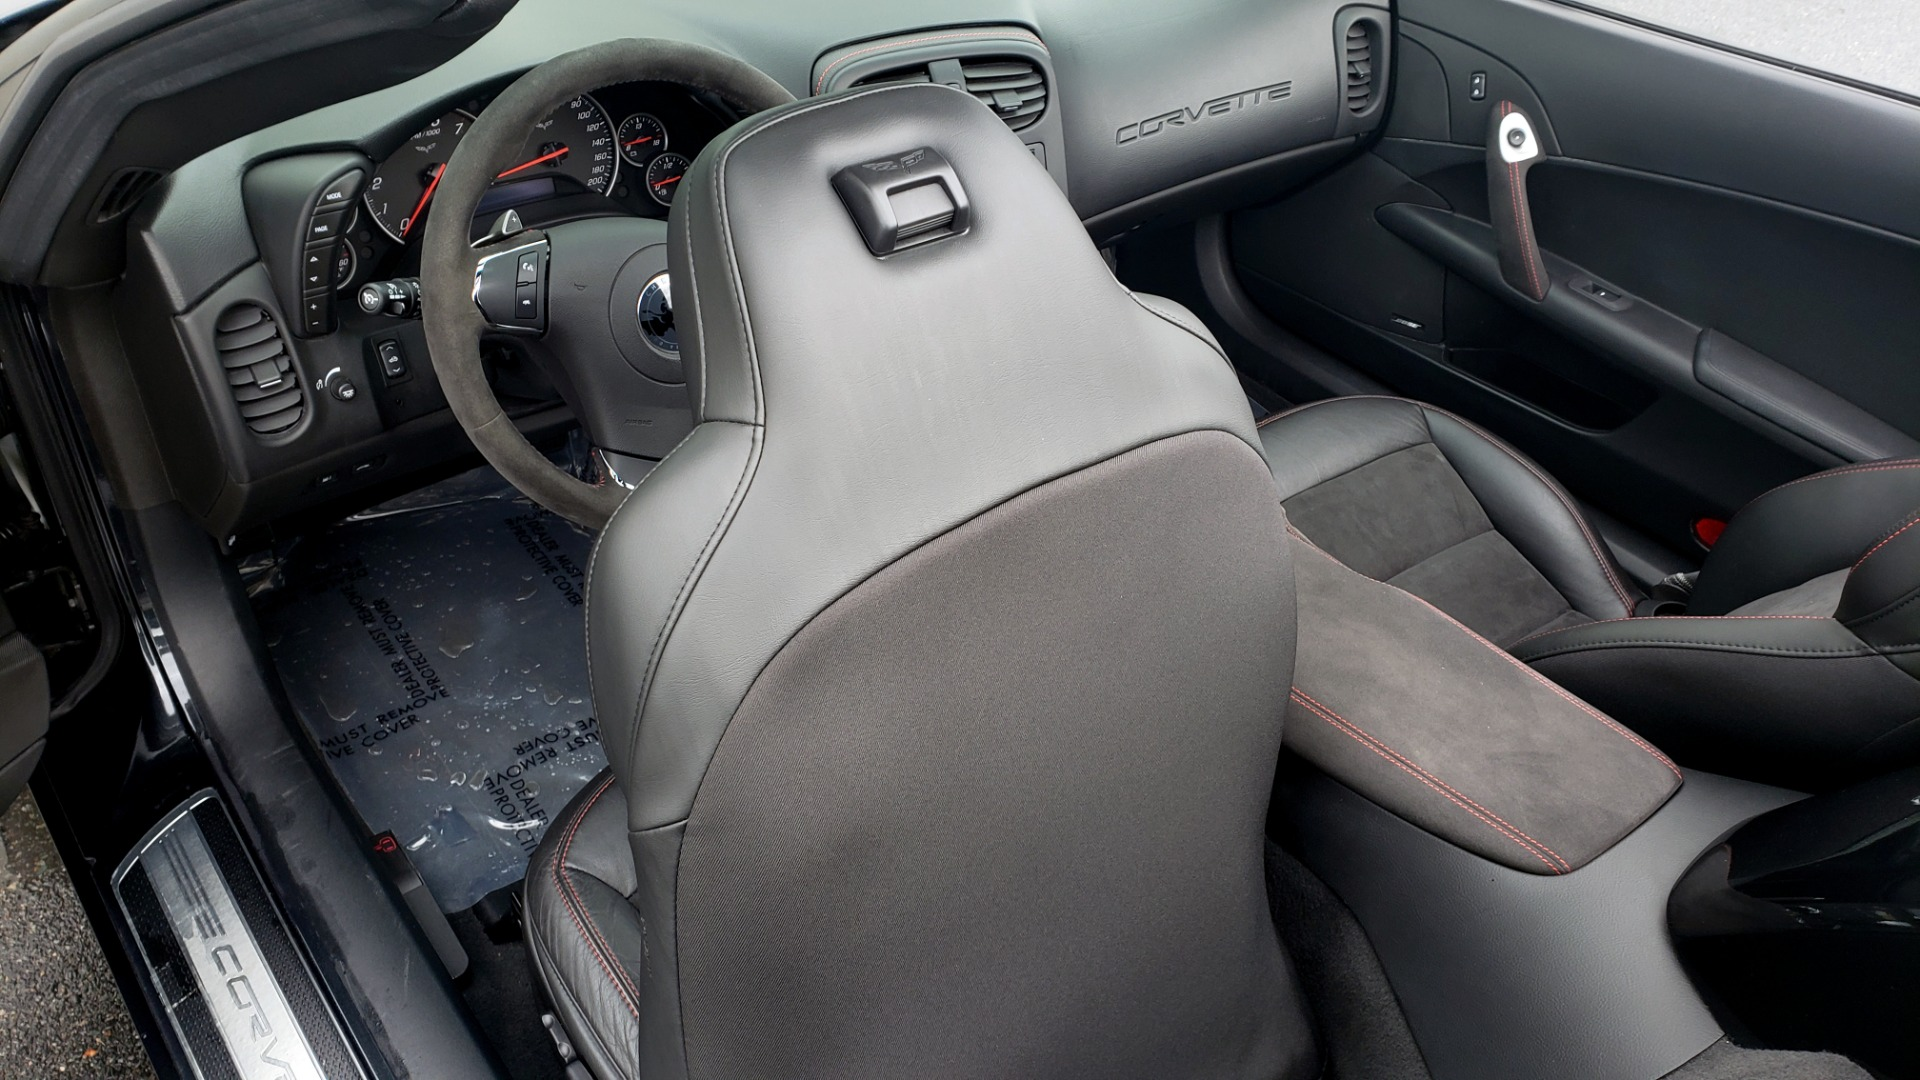 Used 2012 Chevrolet CORVETTE Z16 GRAND SPORT 3LT CONVERTIBLE / 6-SPD AUTO / NAV for sale $38,990 at Formula Imports in Charlotte NC 28227 68